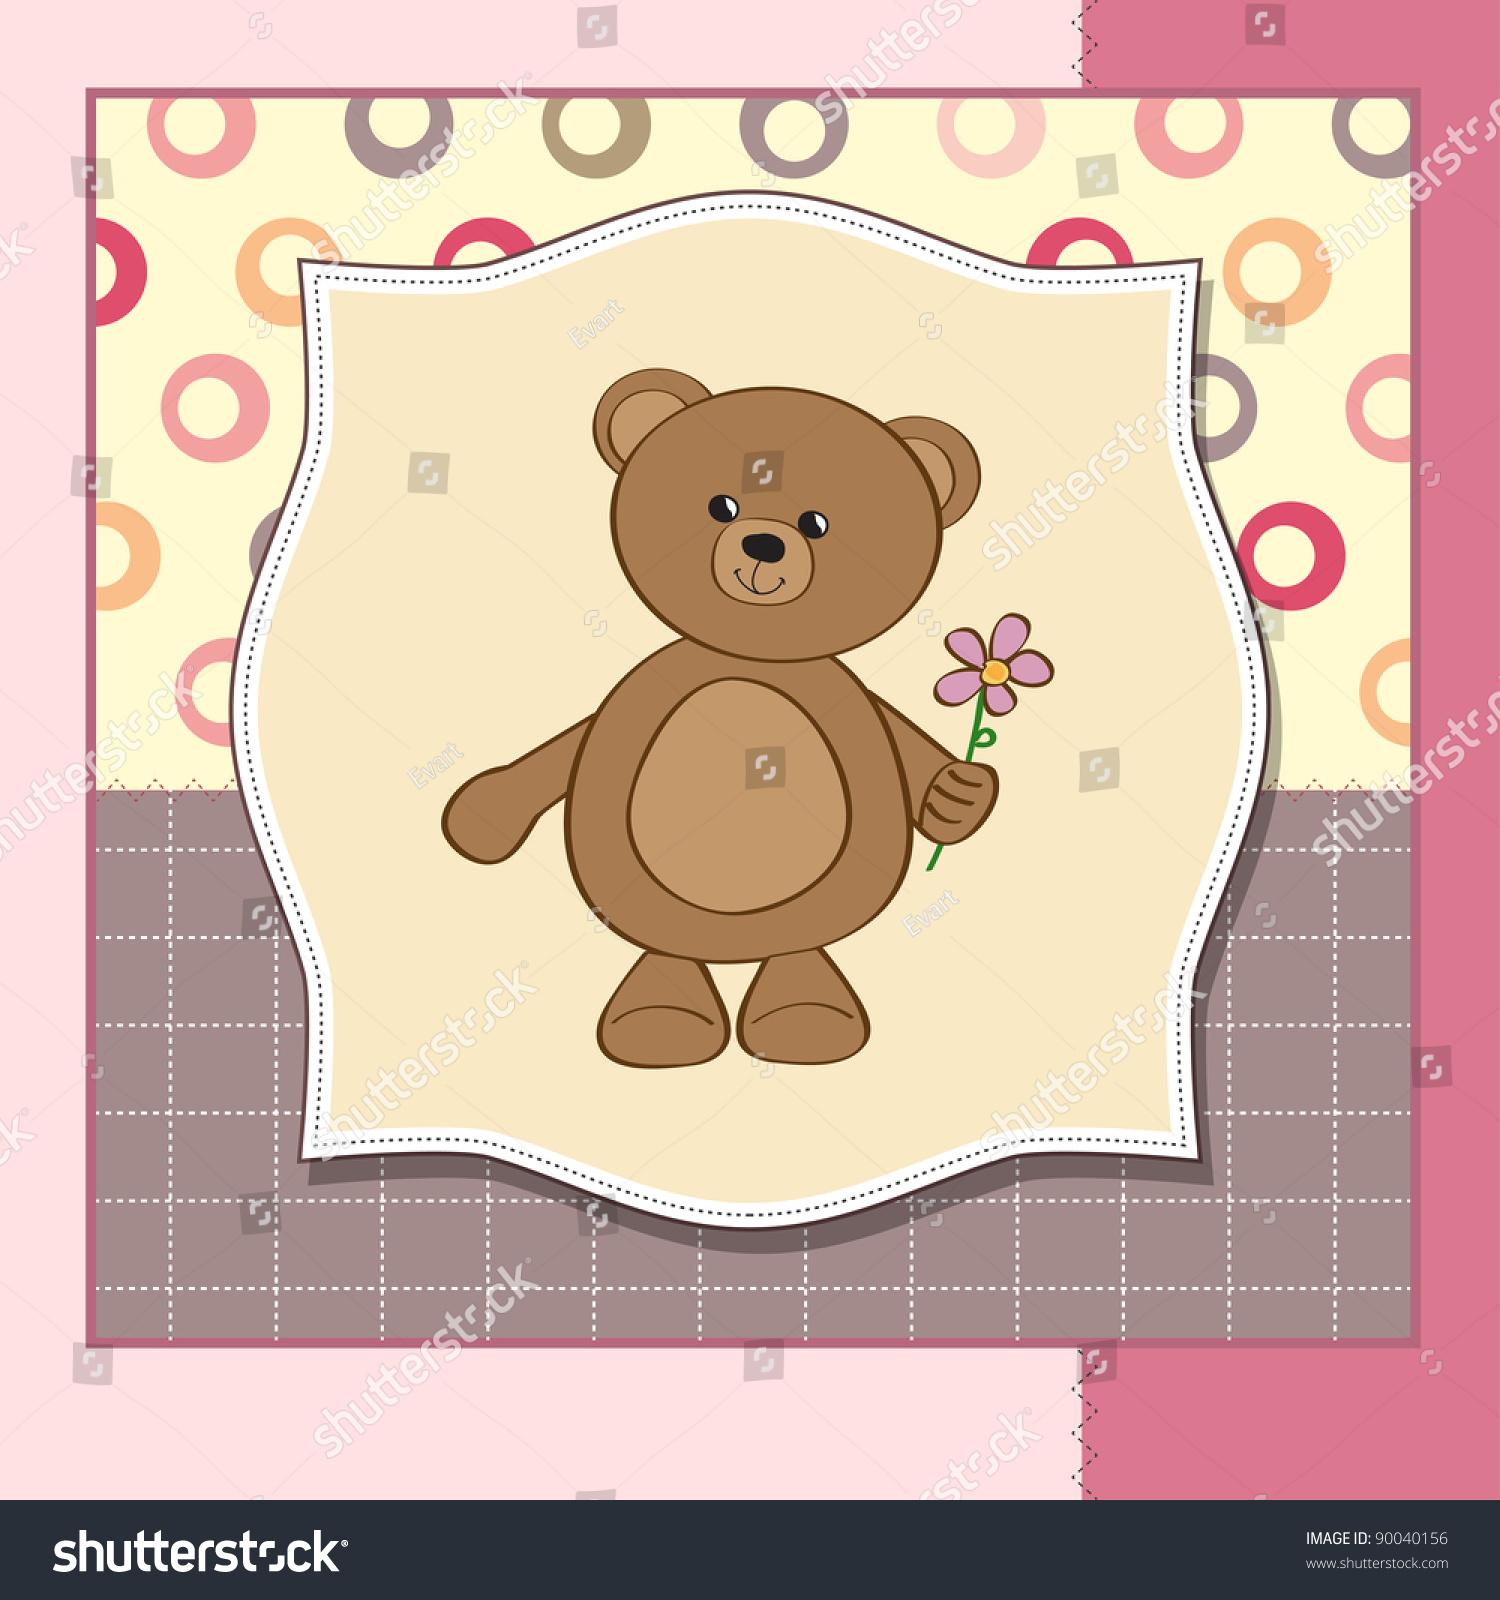 Happy Birthday Card With Teddy Bear And Flower Ez Canvas